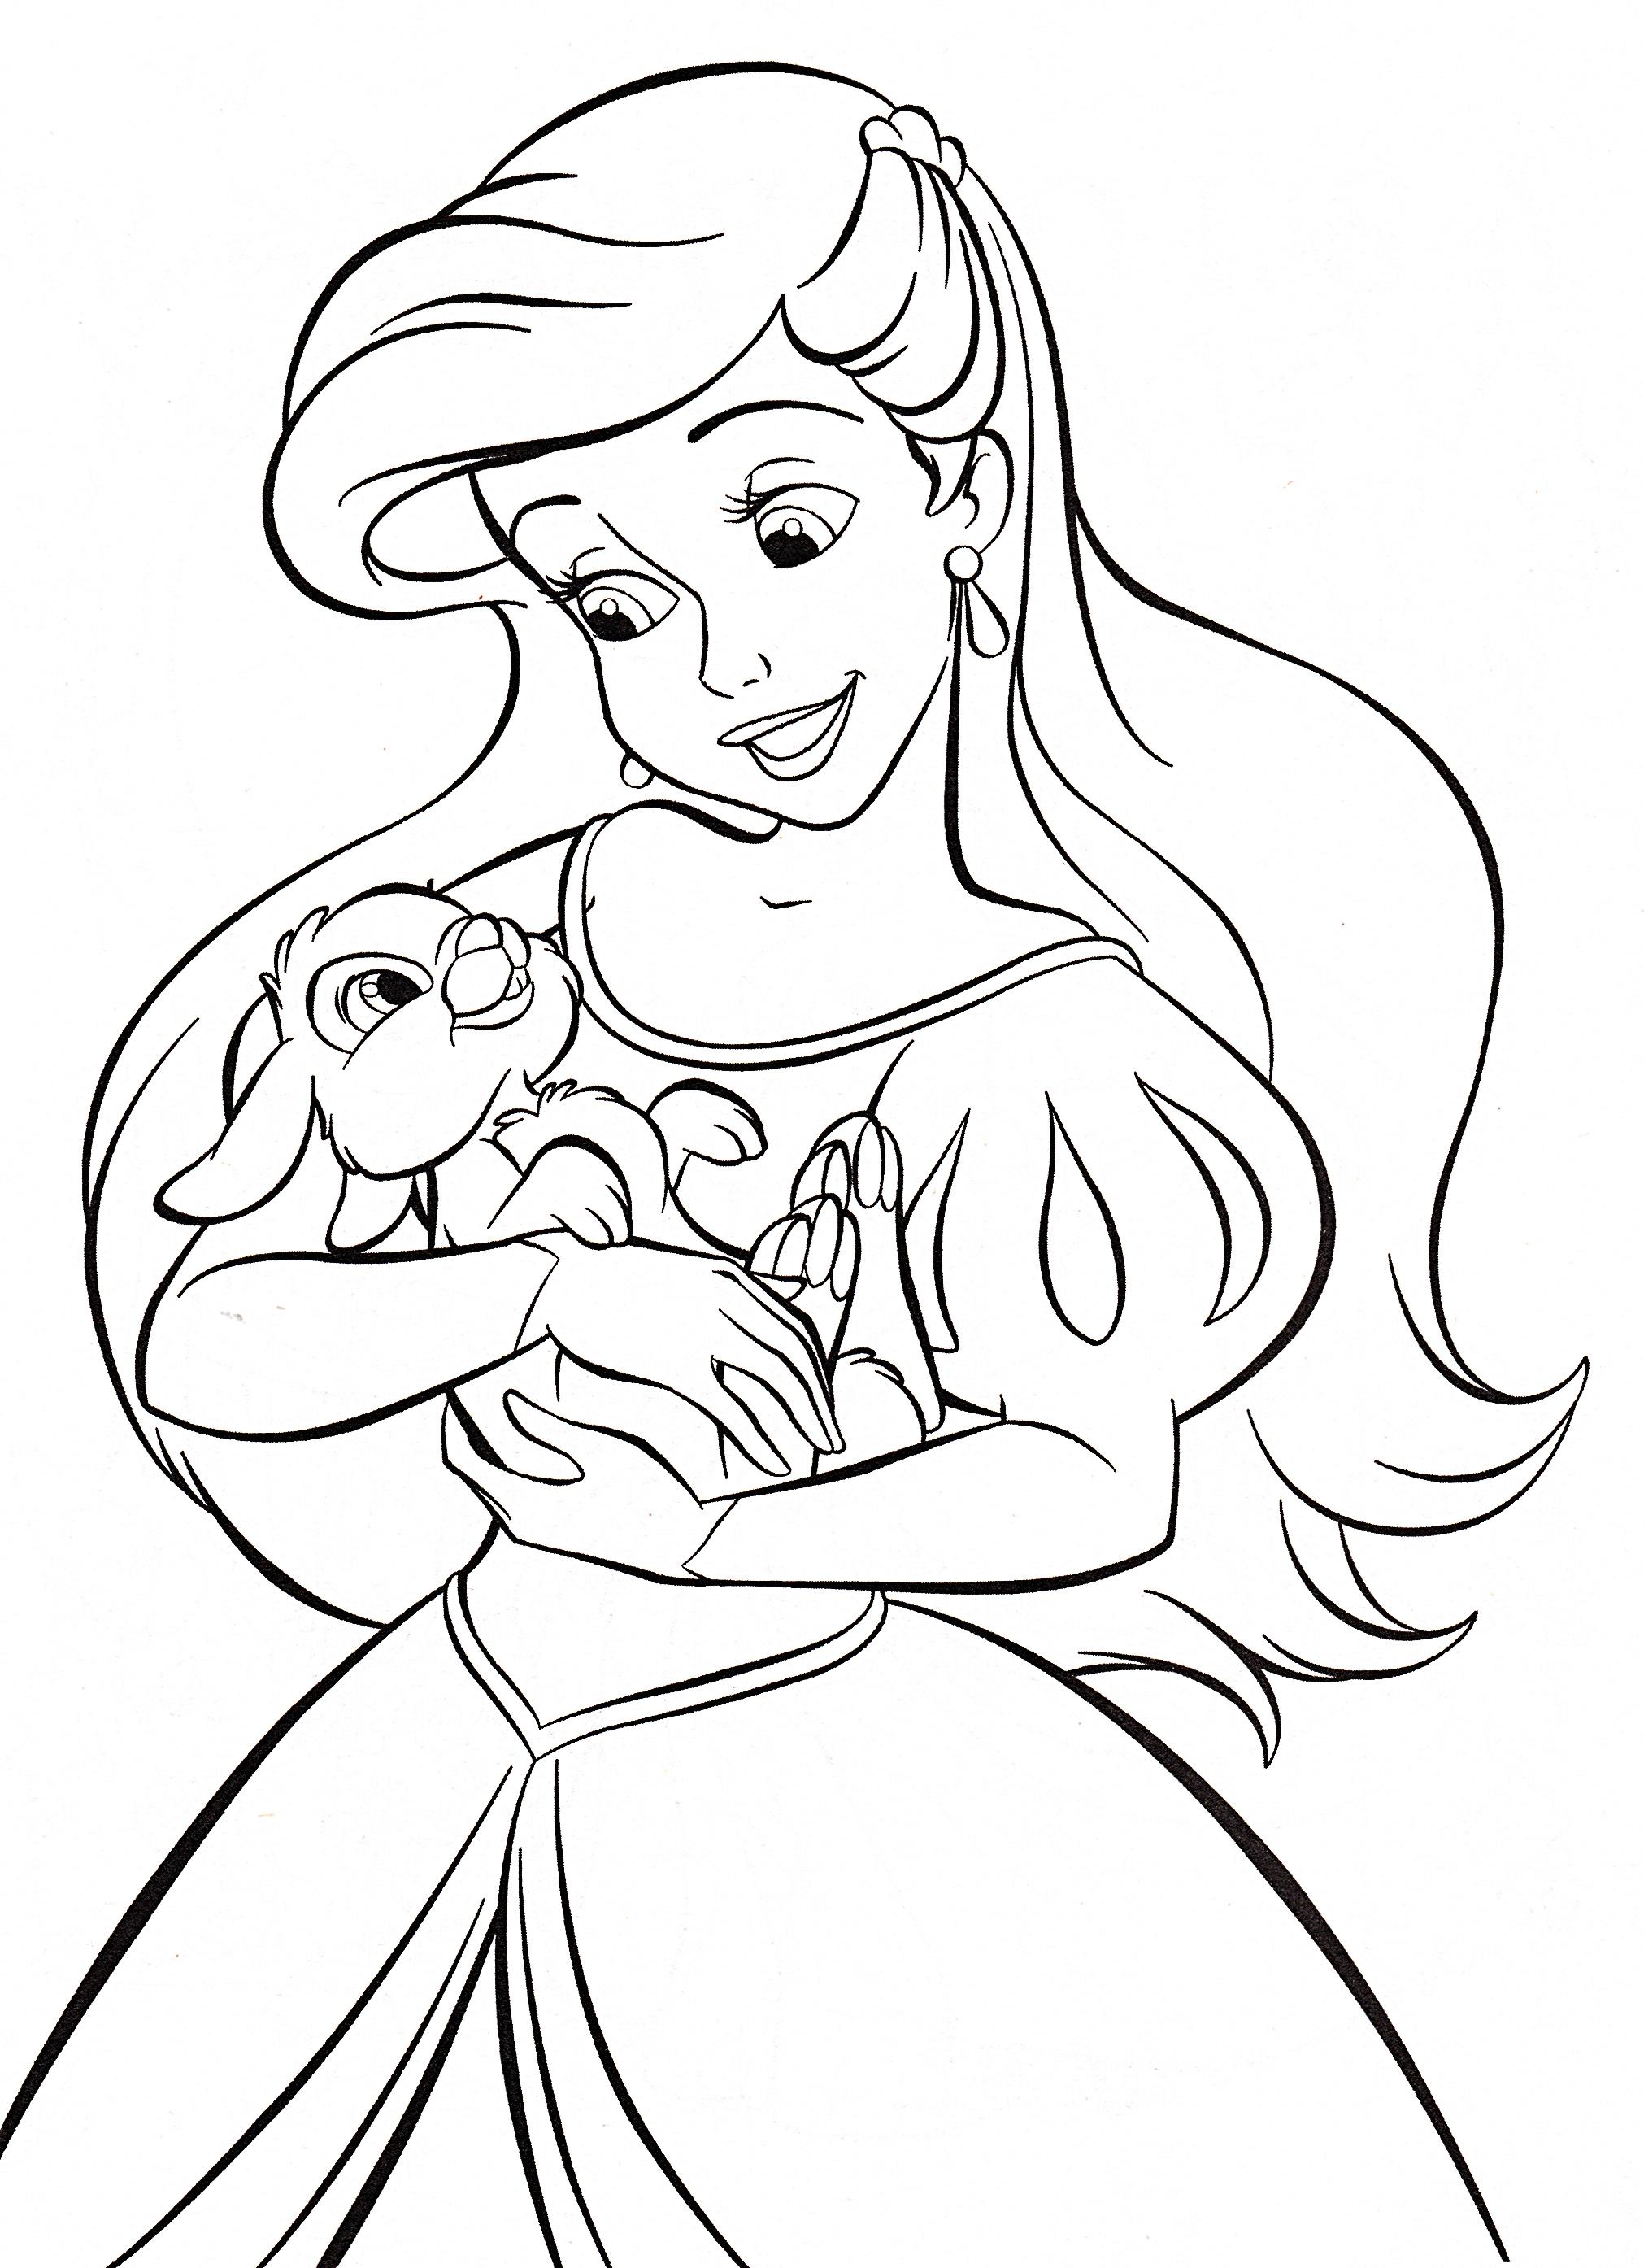 Baby princess coloring pages - Disney Princess Baby Ariel Coloring Pages Princess Coloring Pages Ariel Baby Disney Princess Coloring Pages